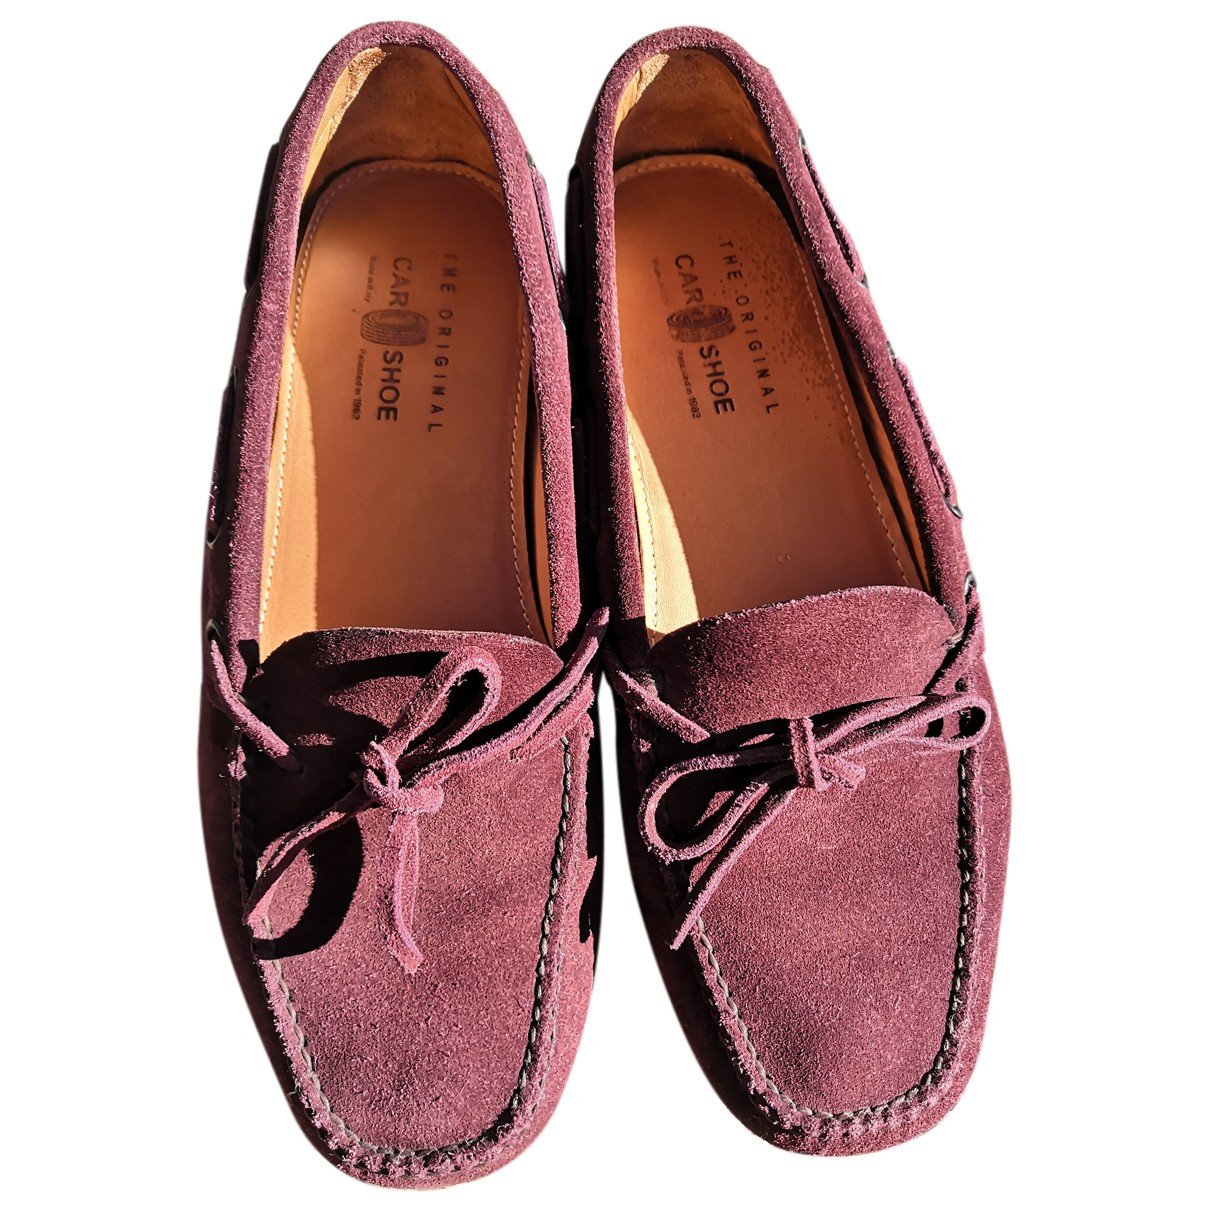 Carshoe N Burgundy Leather Flats for Women 38 EU